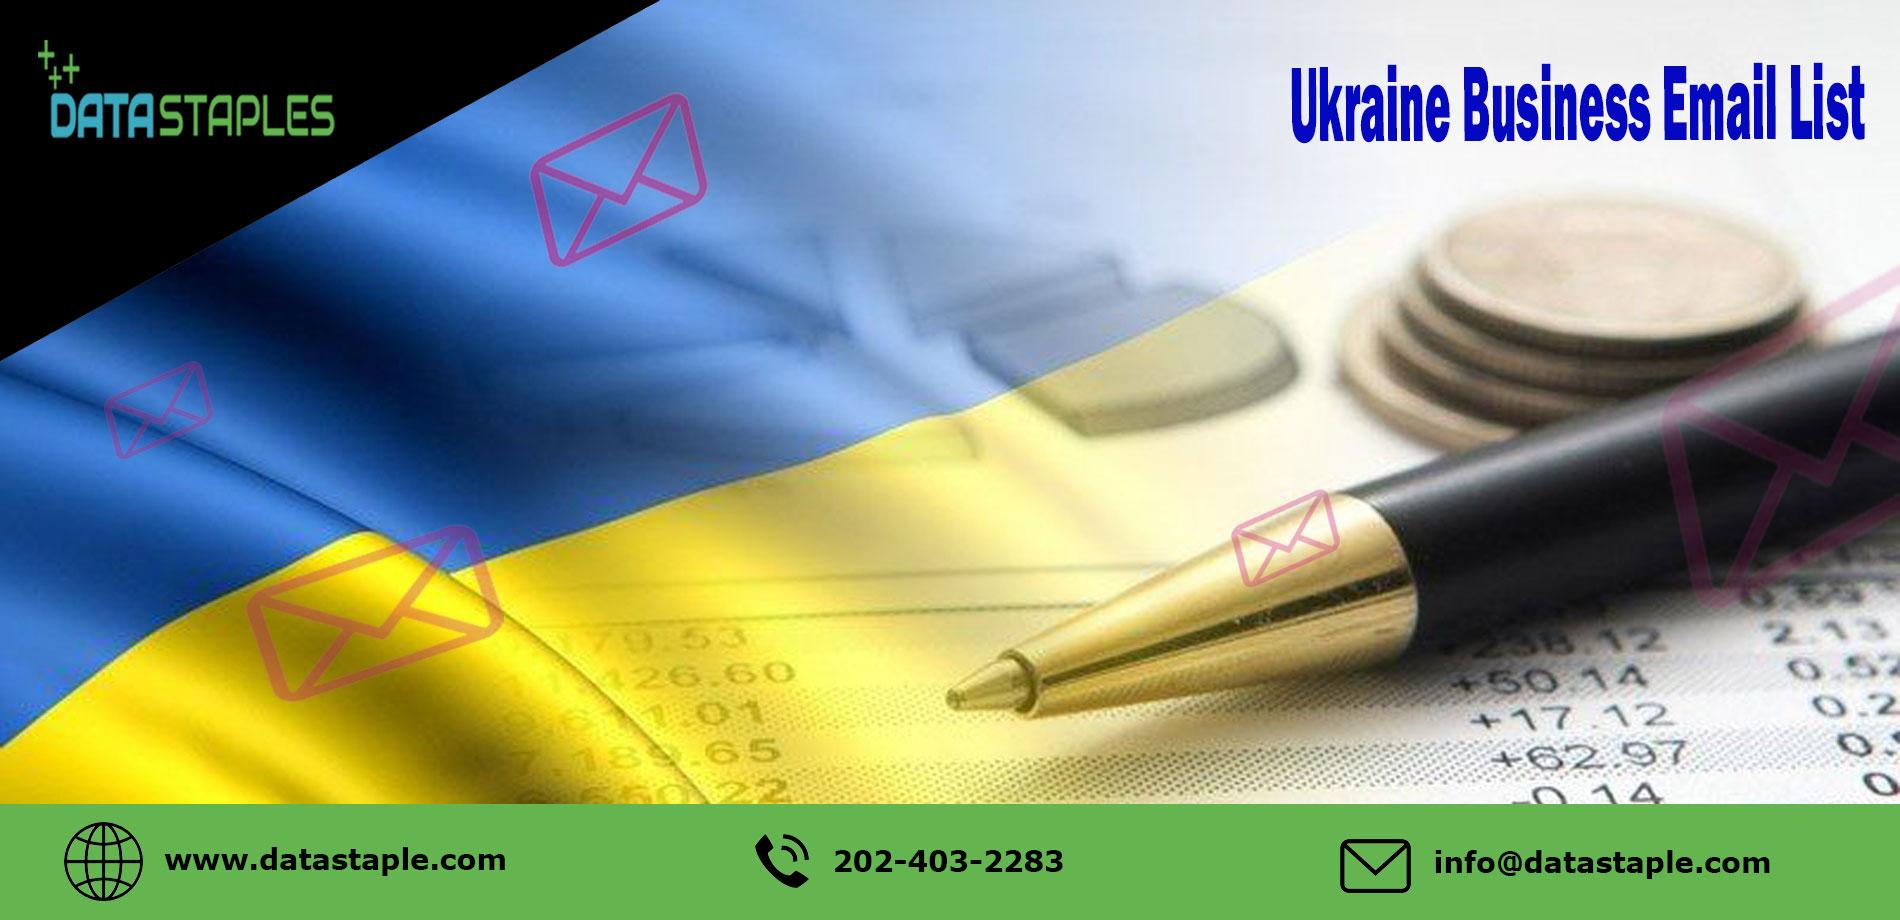 Ukraine Business Email List   DataStaples